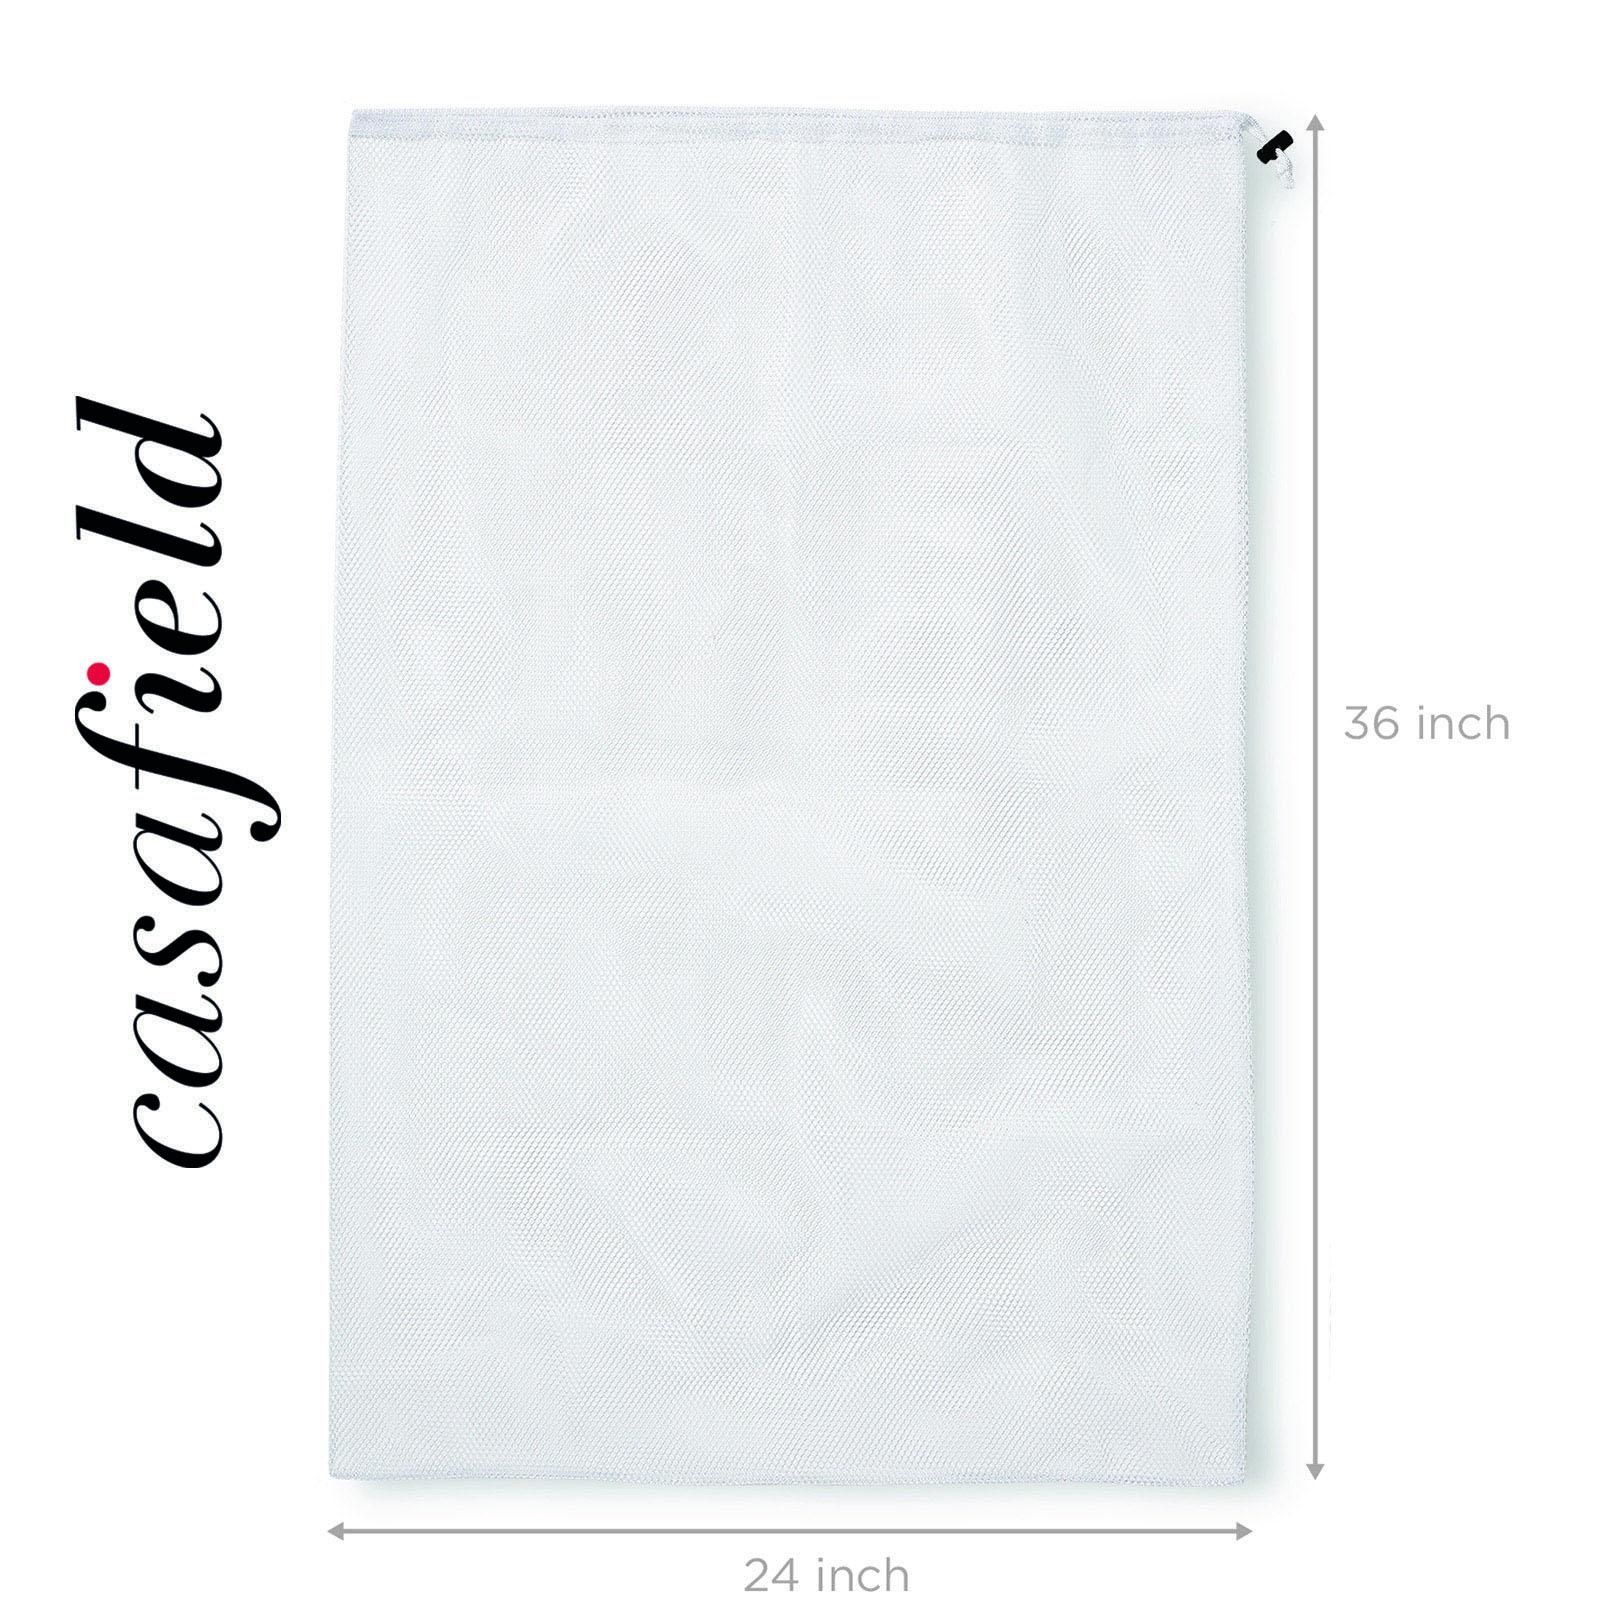 24-034-x-36-034-Large-Heavy-Duty-Mesh-Net-Drawstring-Laundry-or-Equipment-Ball-Bag thumbnail 24